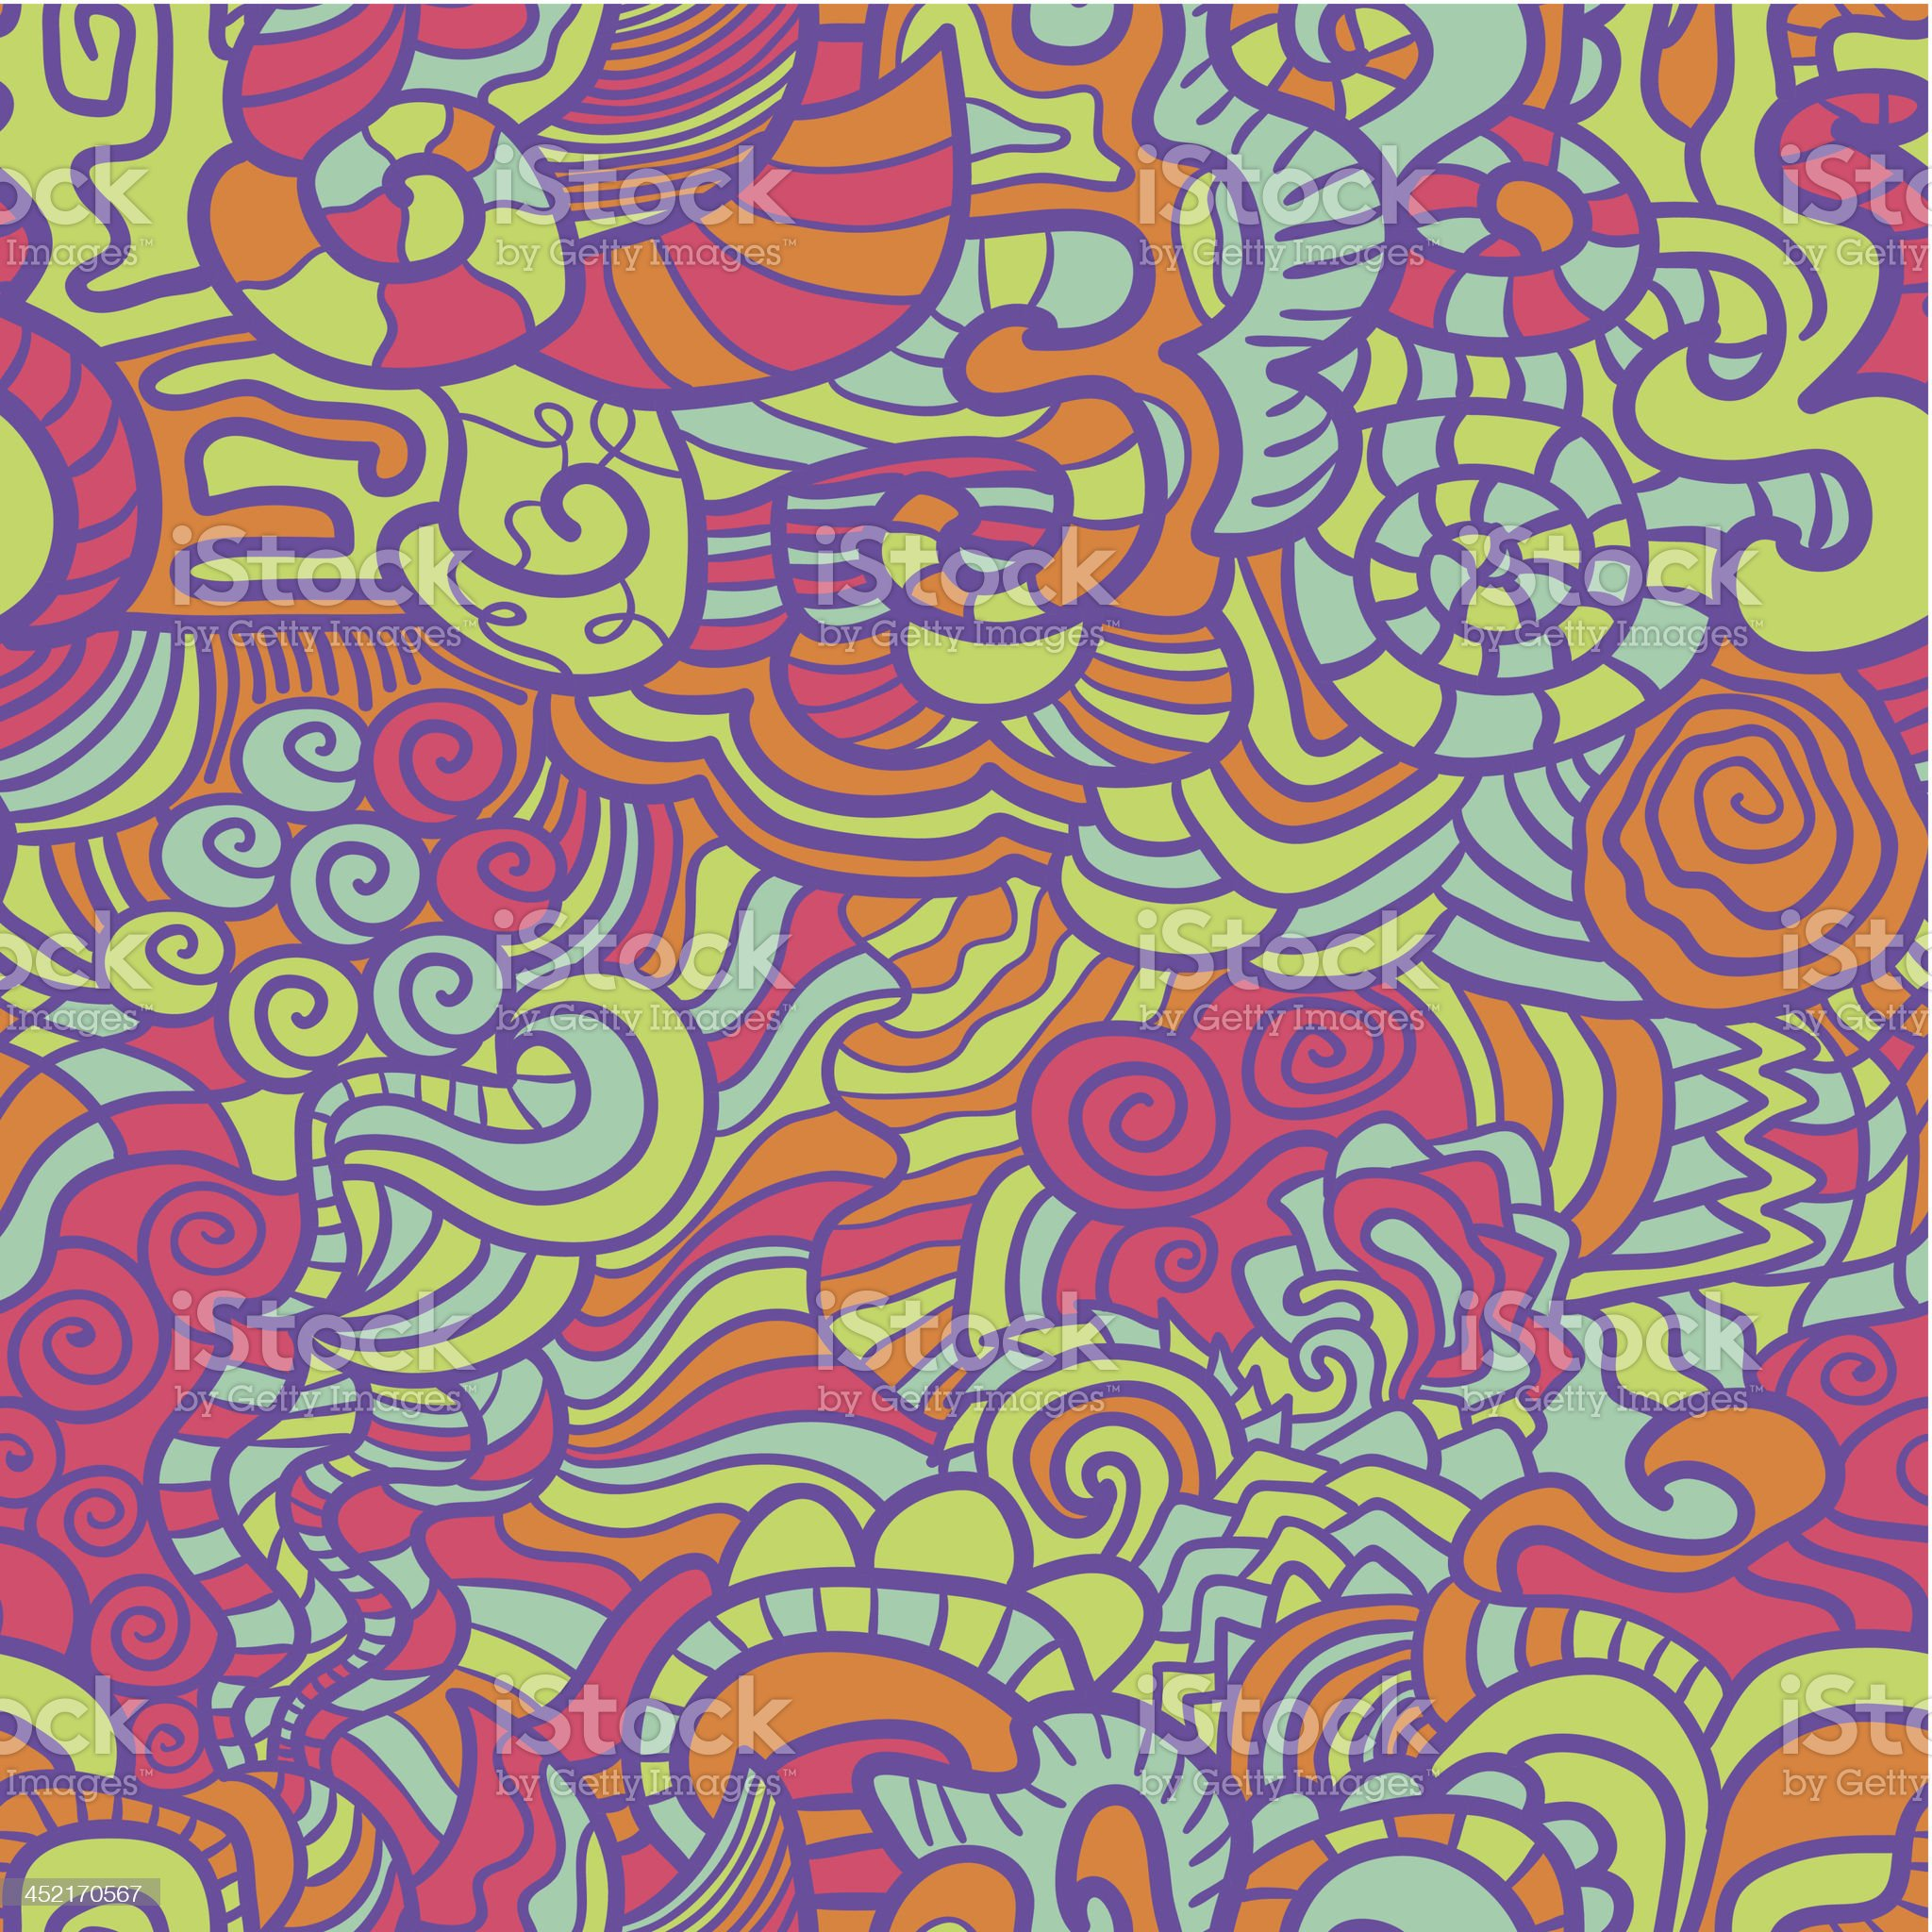 Hand-drawn seamless pattern royalty-free stock vector art